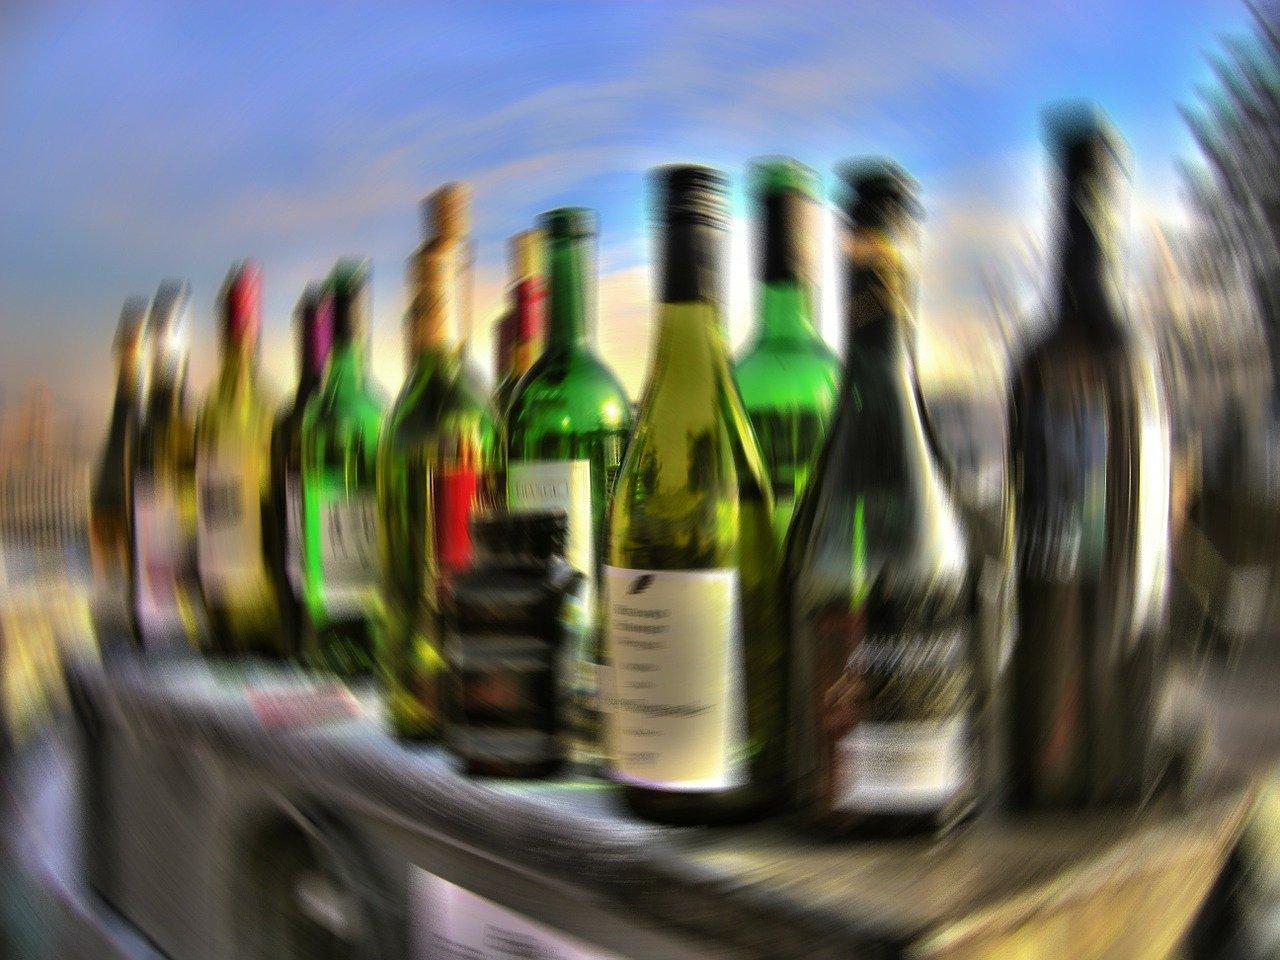 alcohol, drink, alkolismus